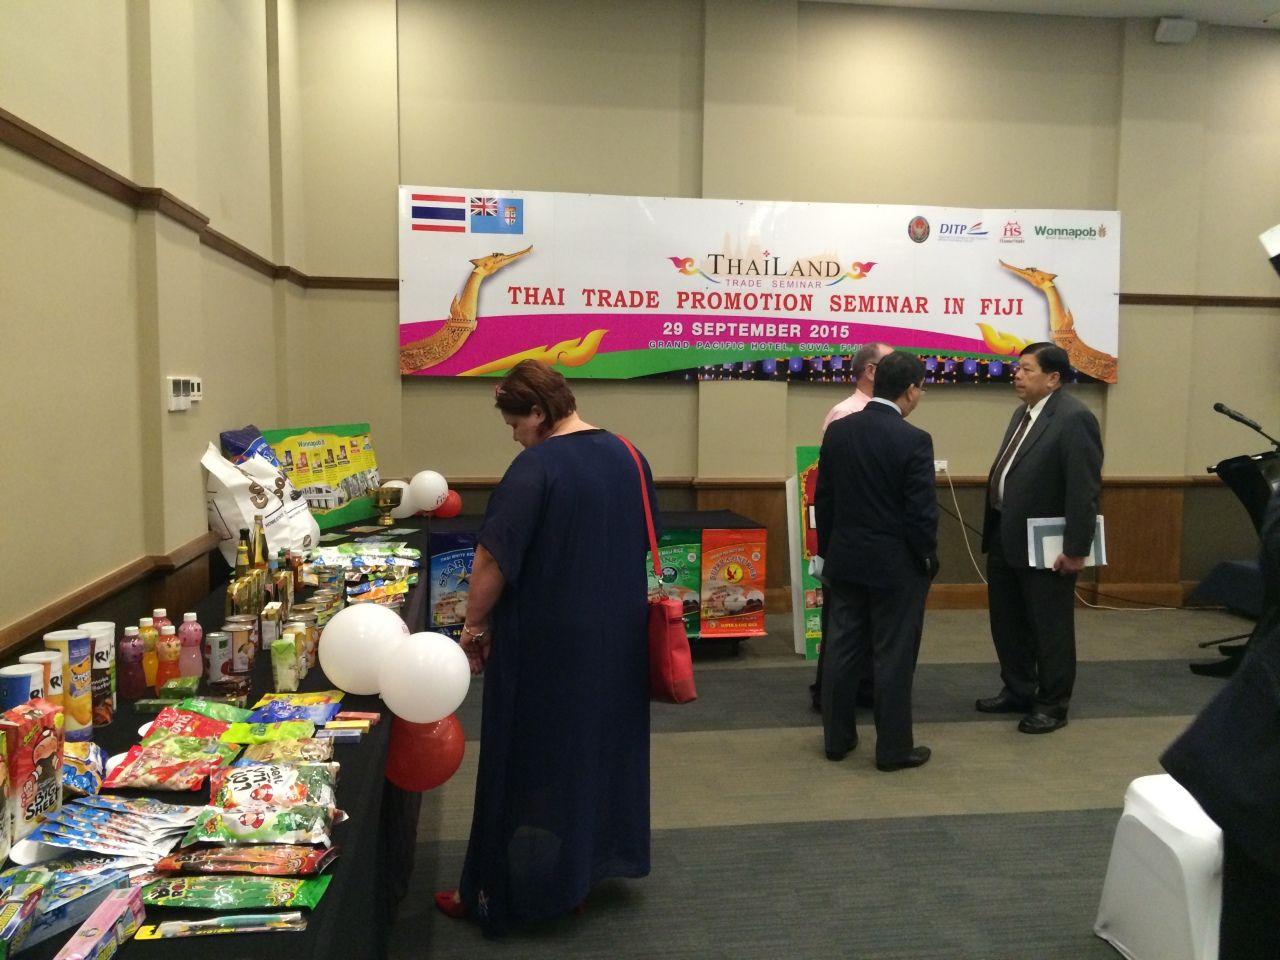 Trade Show at Fiji on 29 September 2015